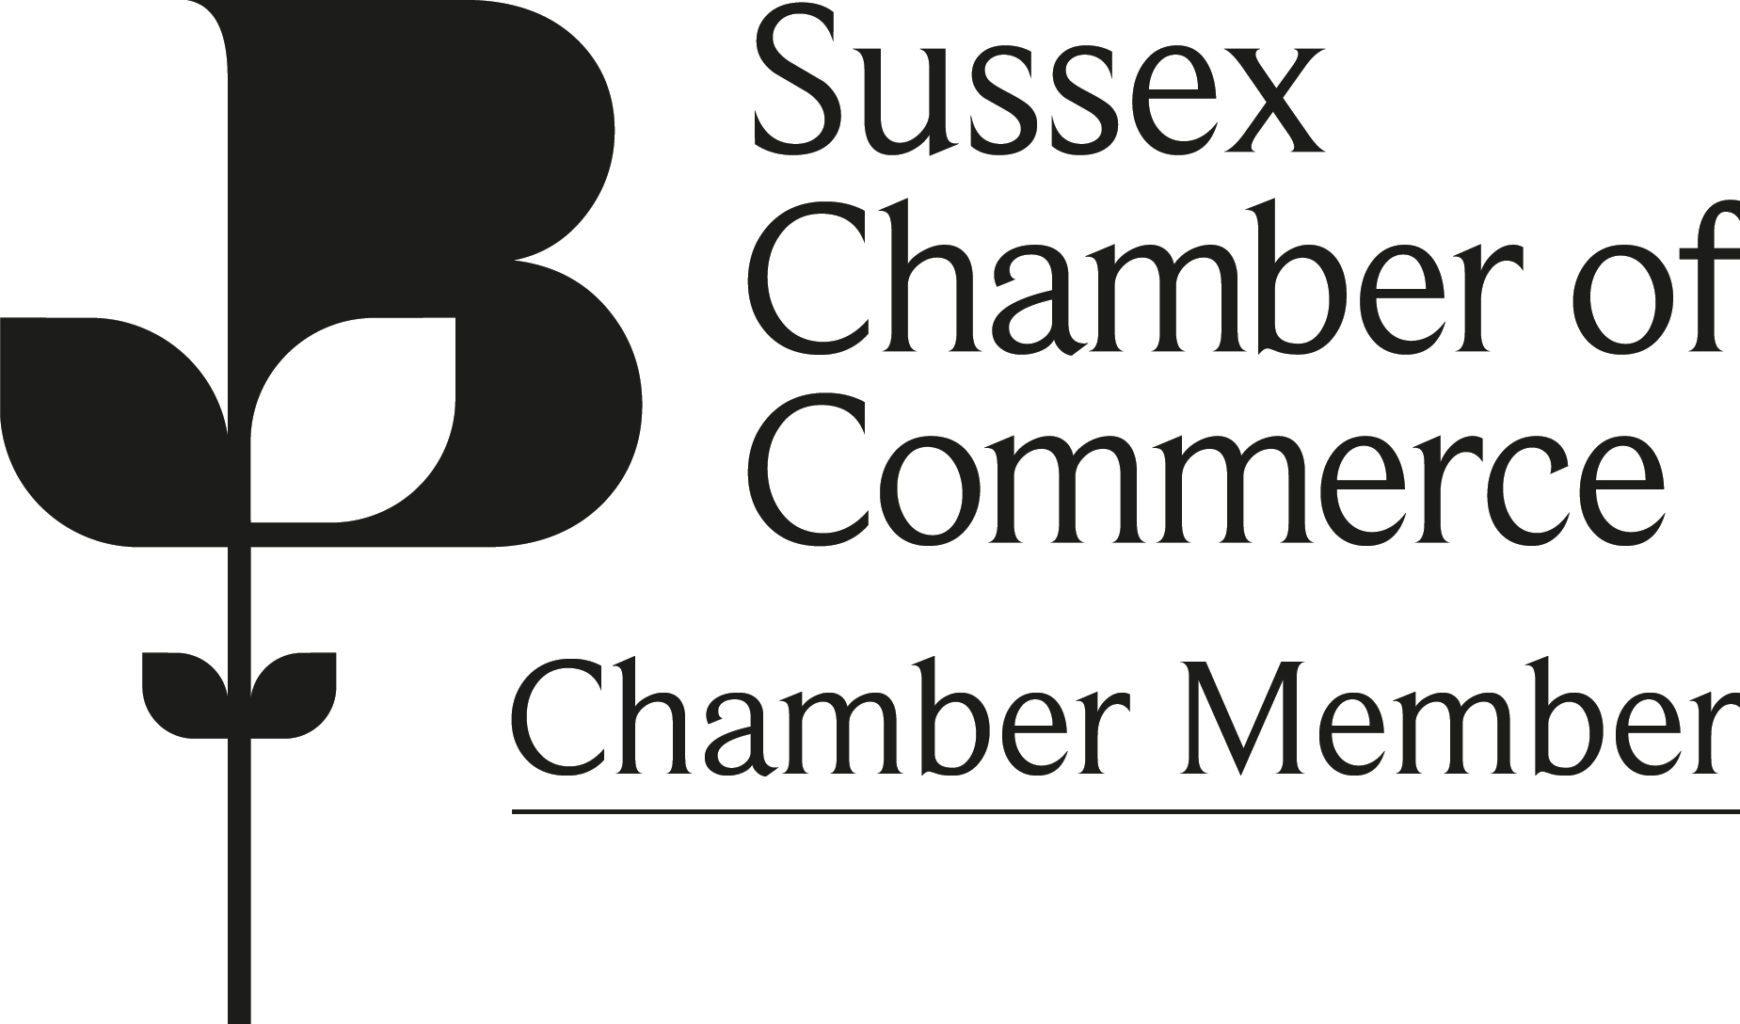 Sussex chamber member logo